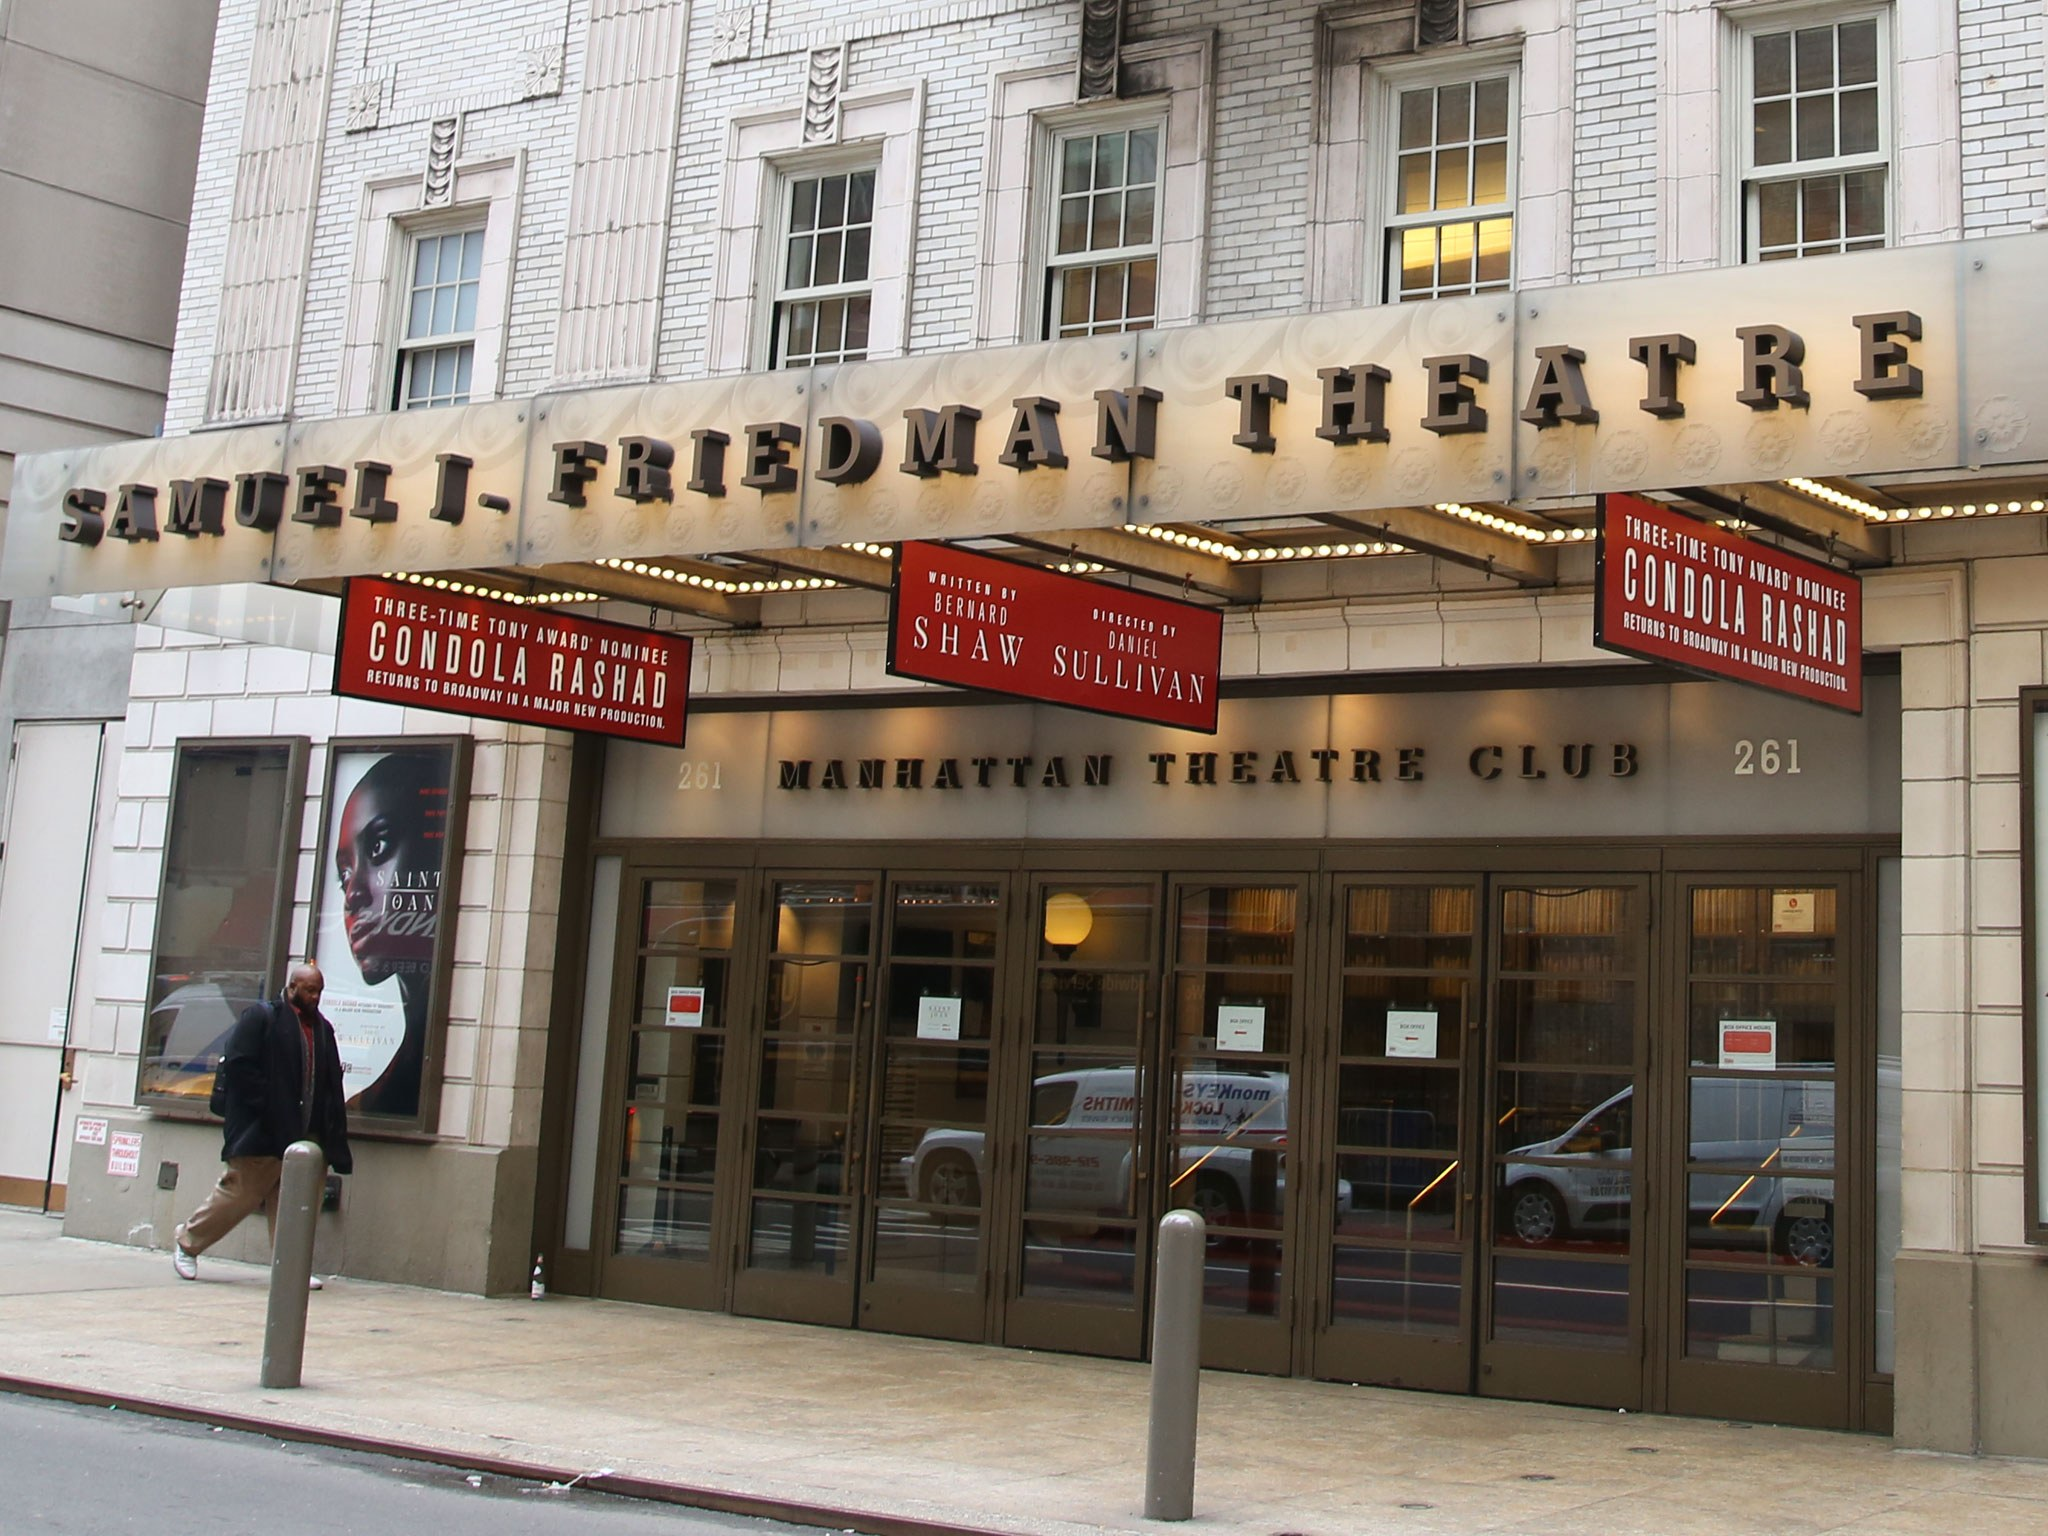 Samuel J Friedman Theatre